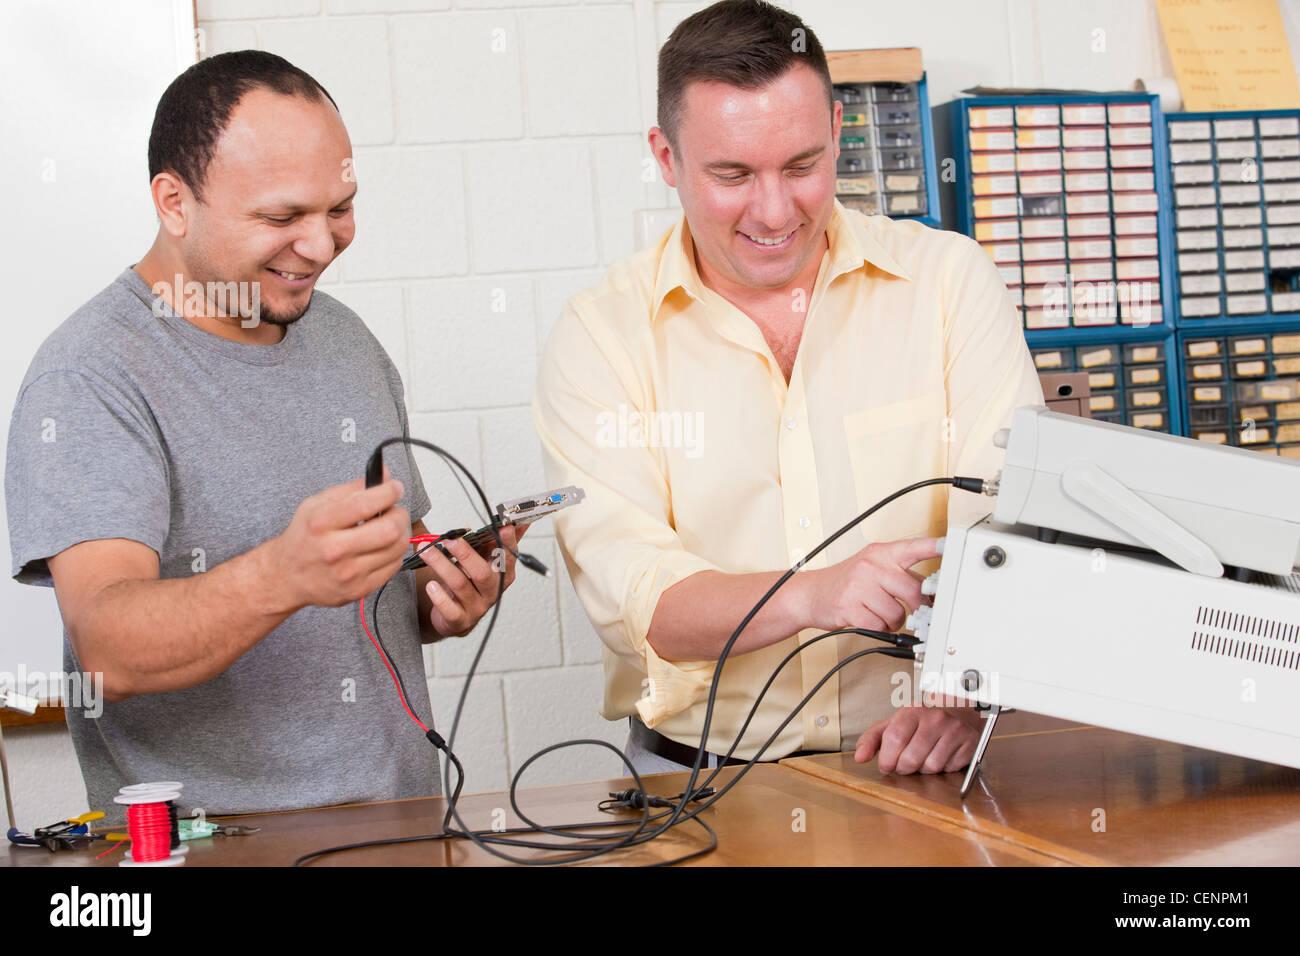 Engineering students using oscilloscope and function generator - Stock Image